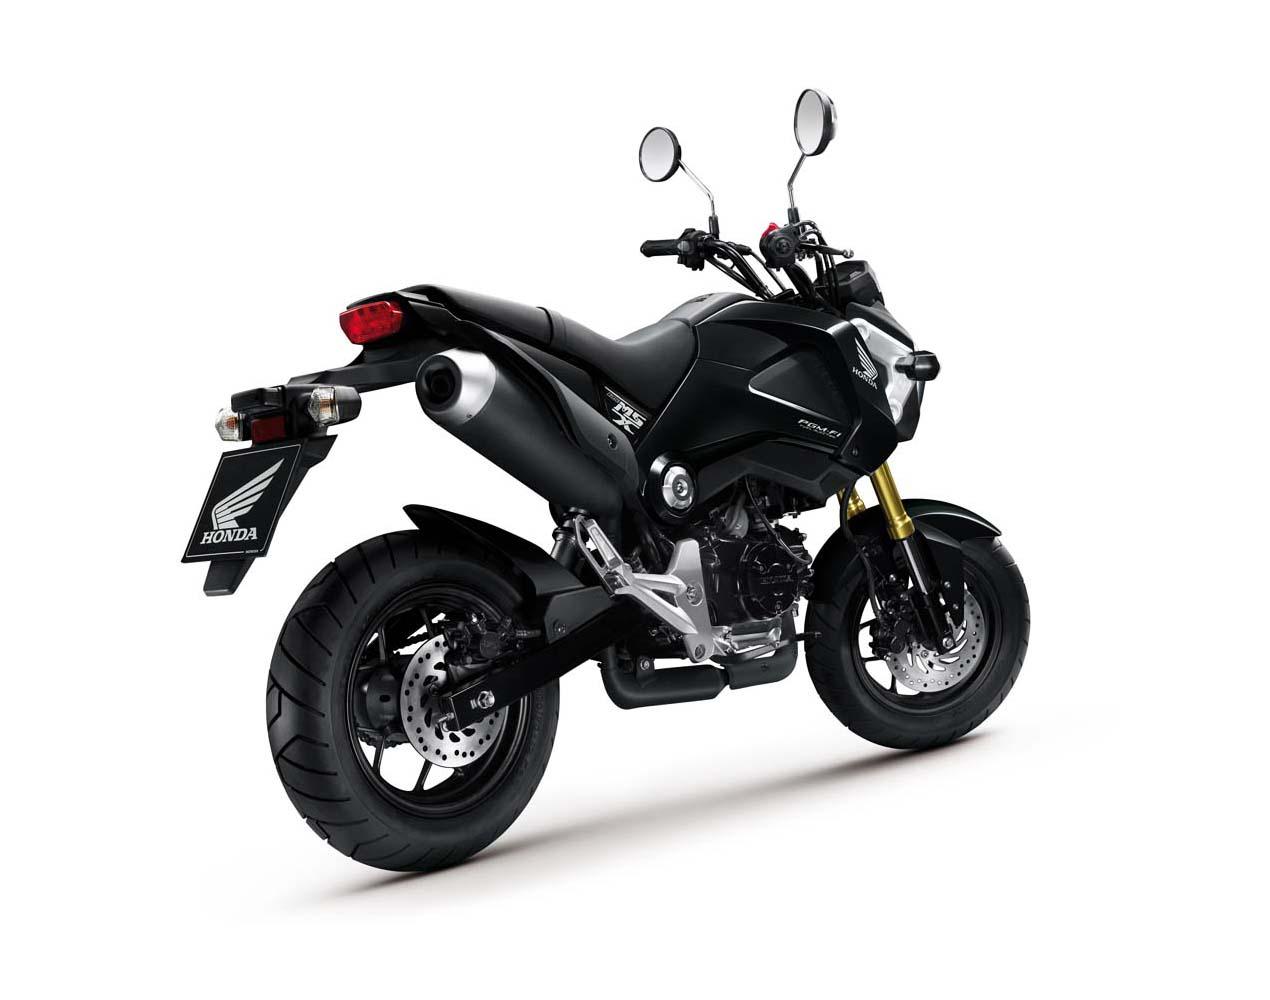 2013 Honda Msx125 Detailed Pictures Autoevolution